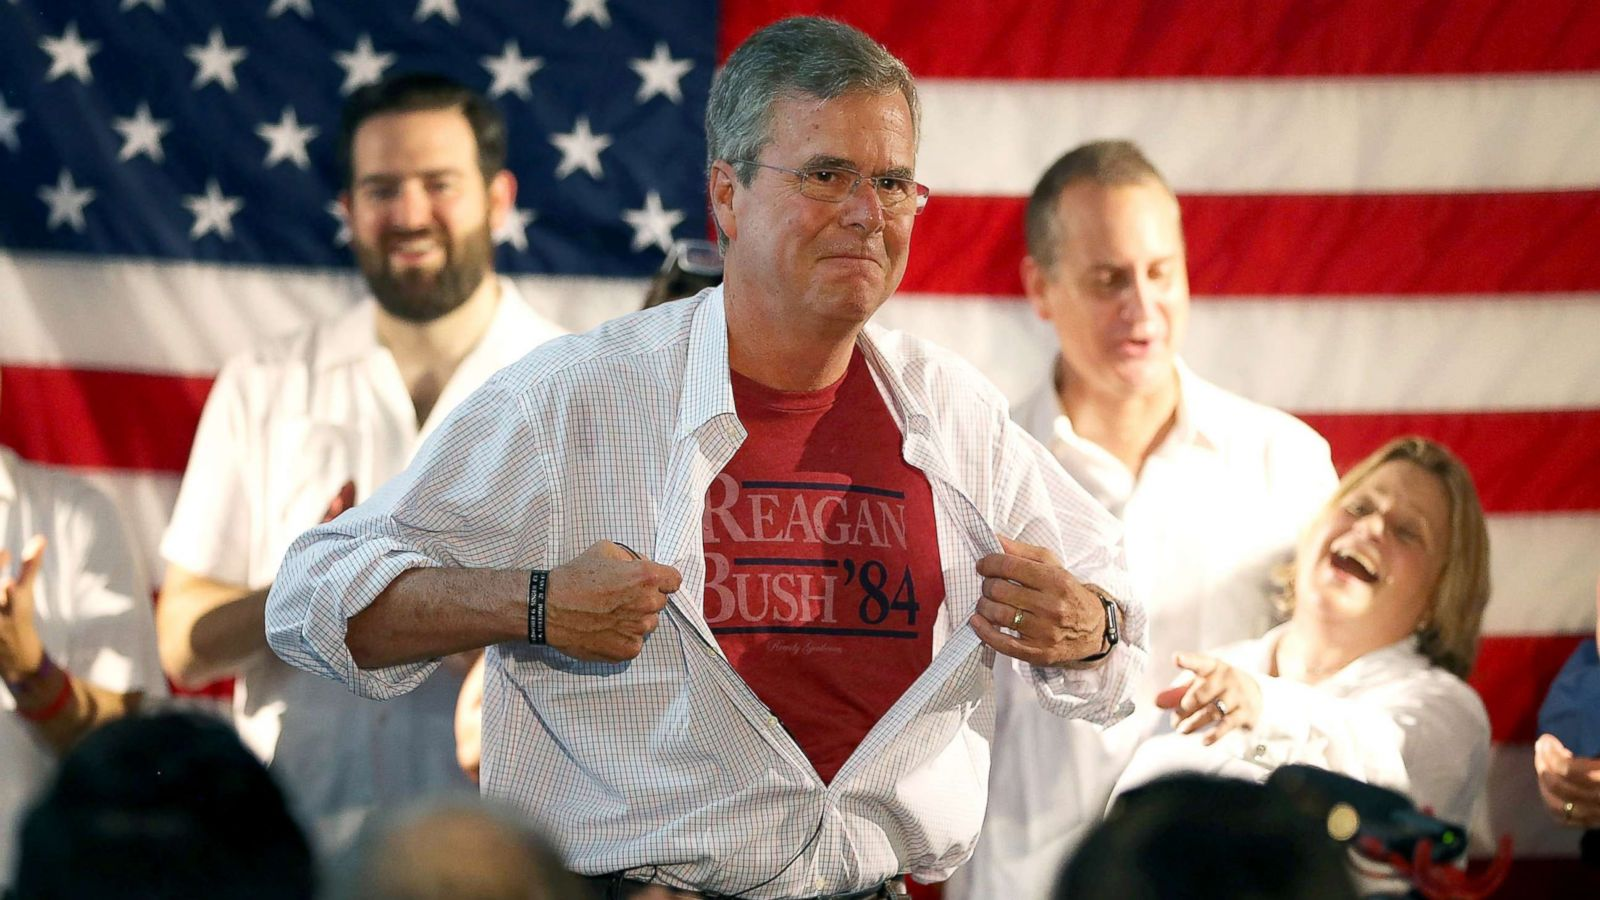 Reagan Mens USA Flag Leisure T-Shirt